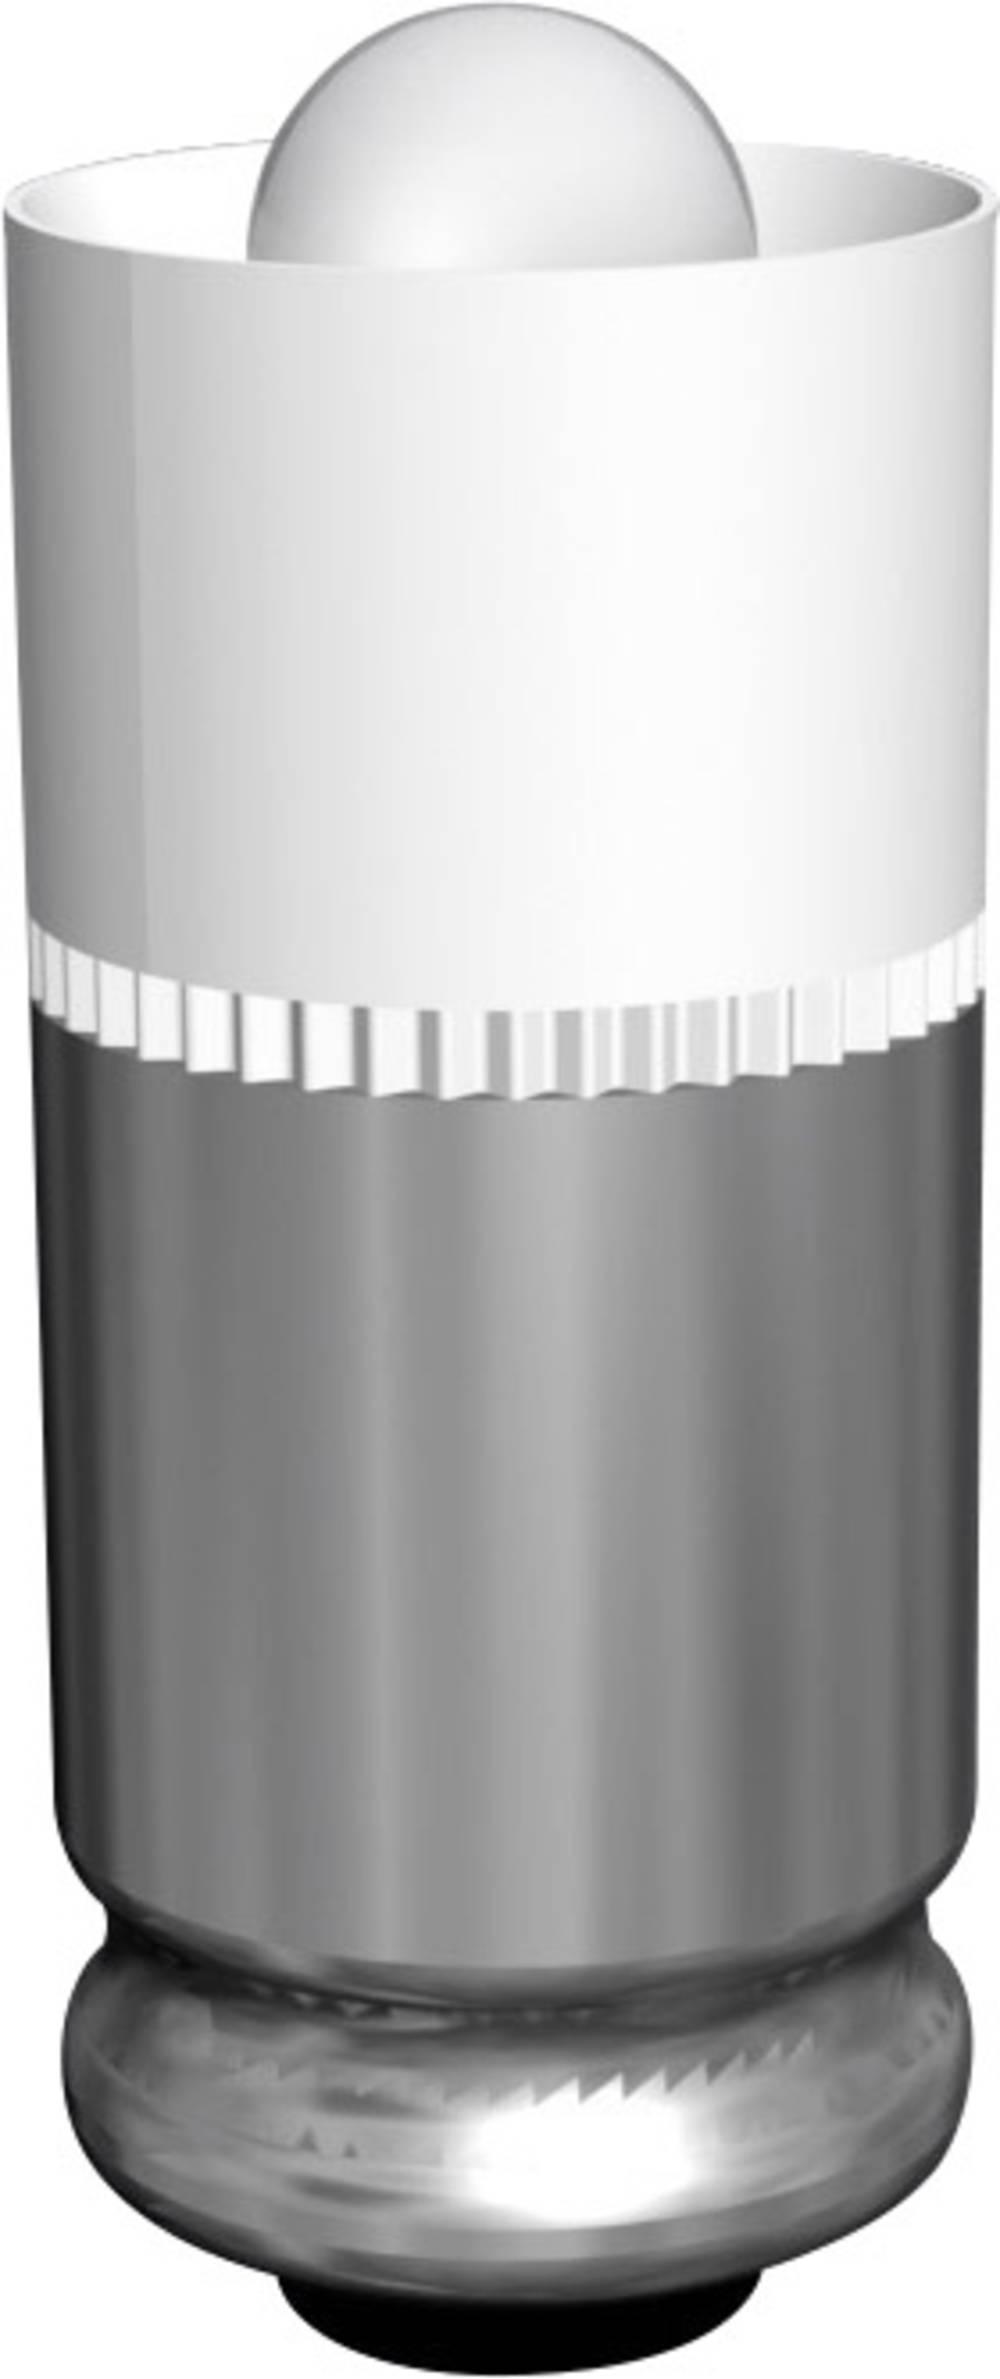 LED žarnica T1 3/4 MG bela 24 V/DC 2000 mcd 428 mlm Signal Construct MEDG5764